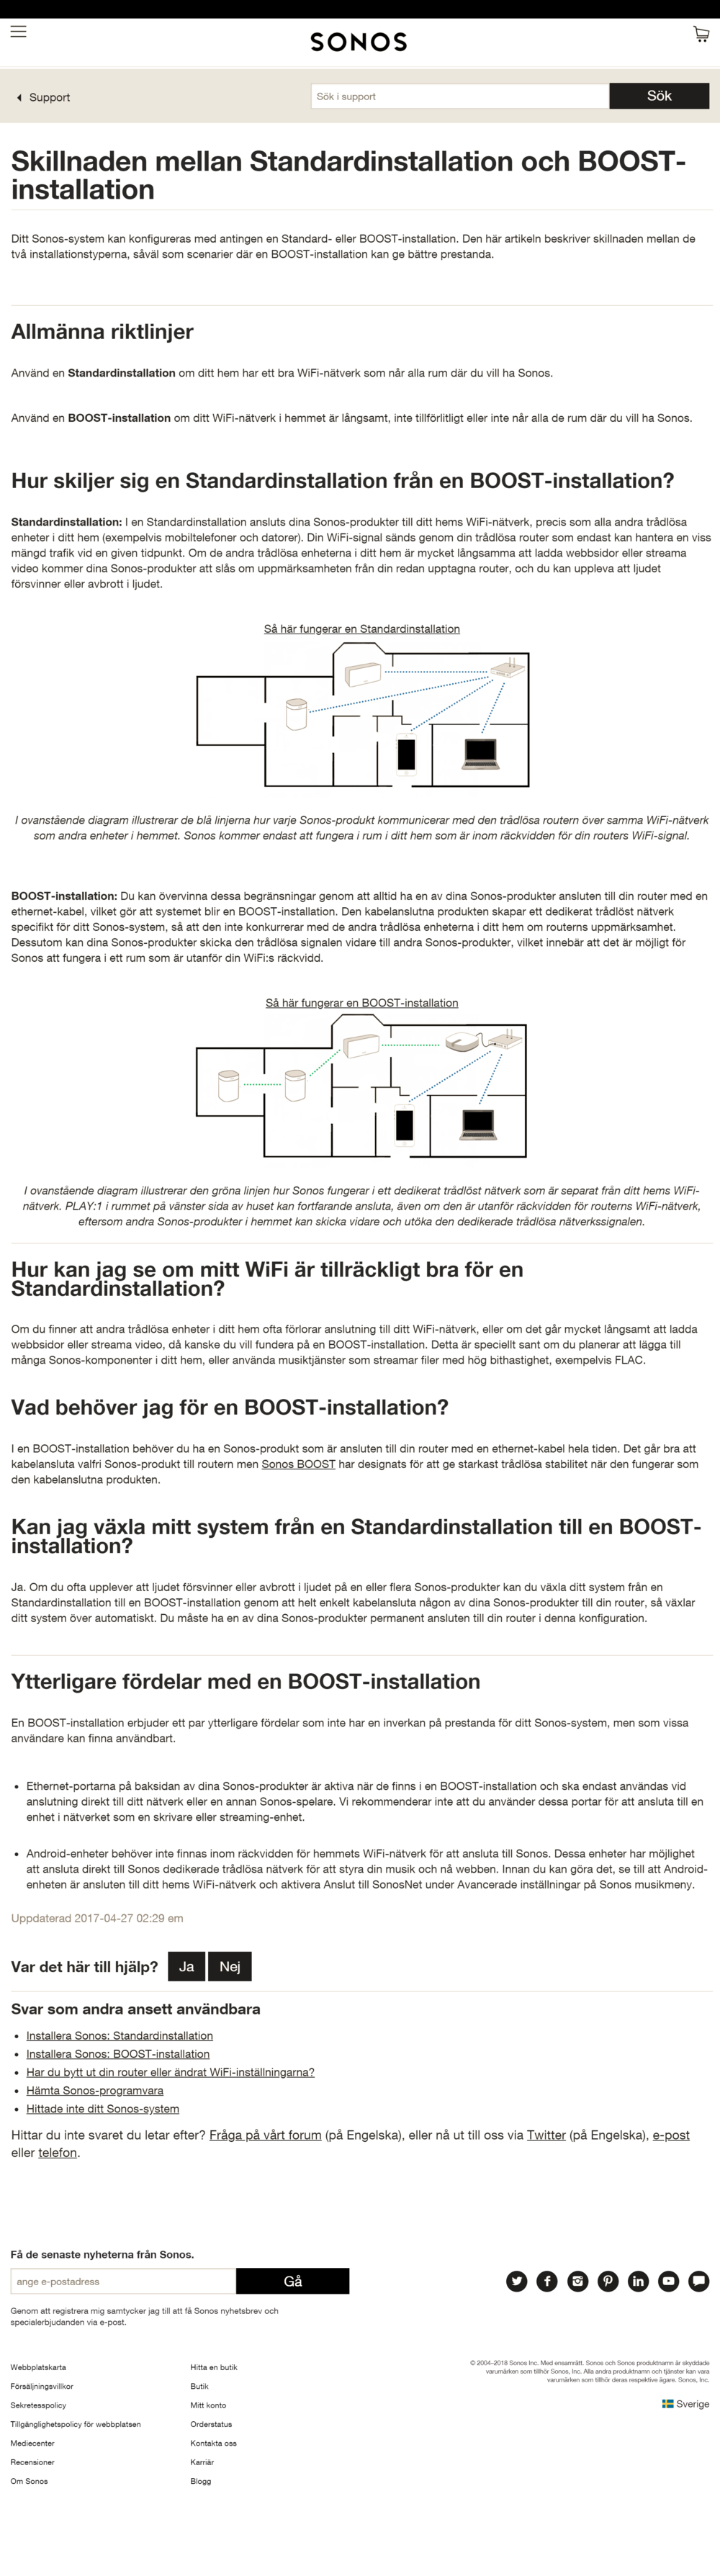 sonos-sv.custhelp.com_app_answers_detail_a_id_3(iPad Pro).png